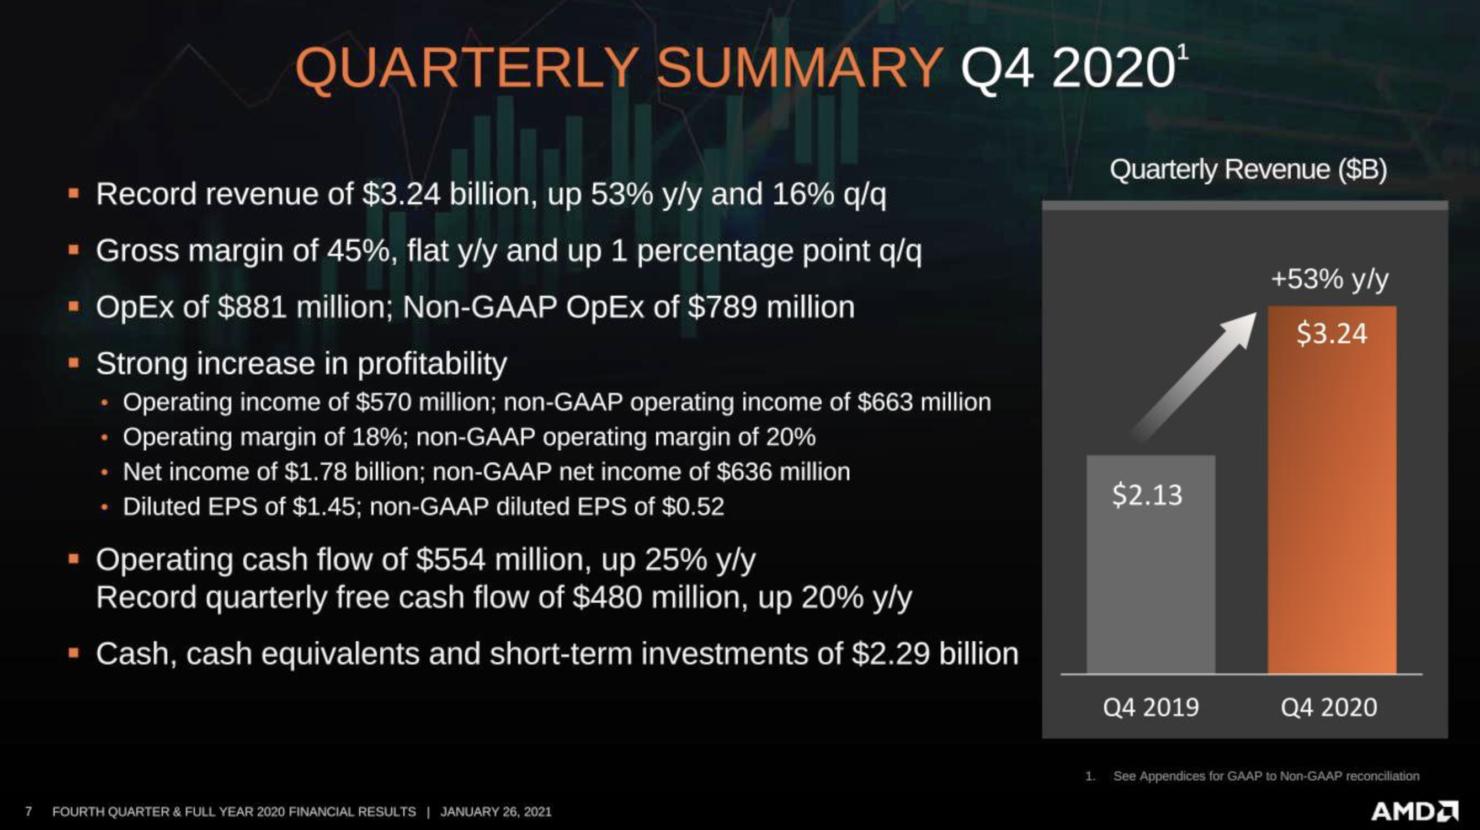 AMD Q4 2020 Earnings